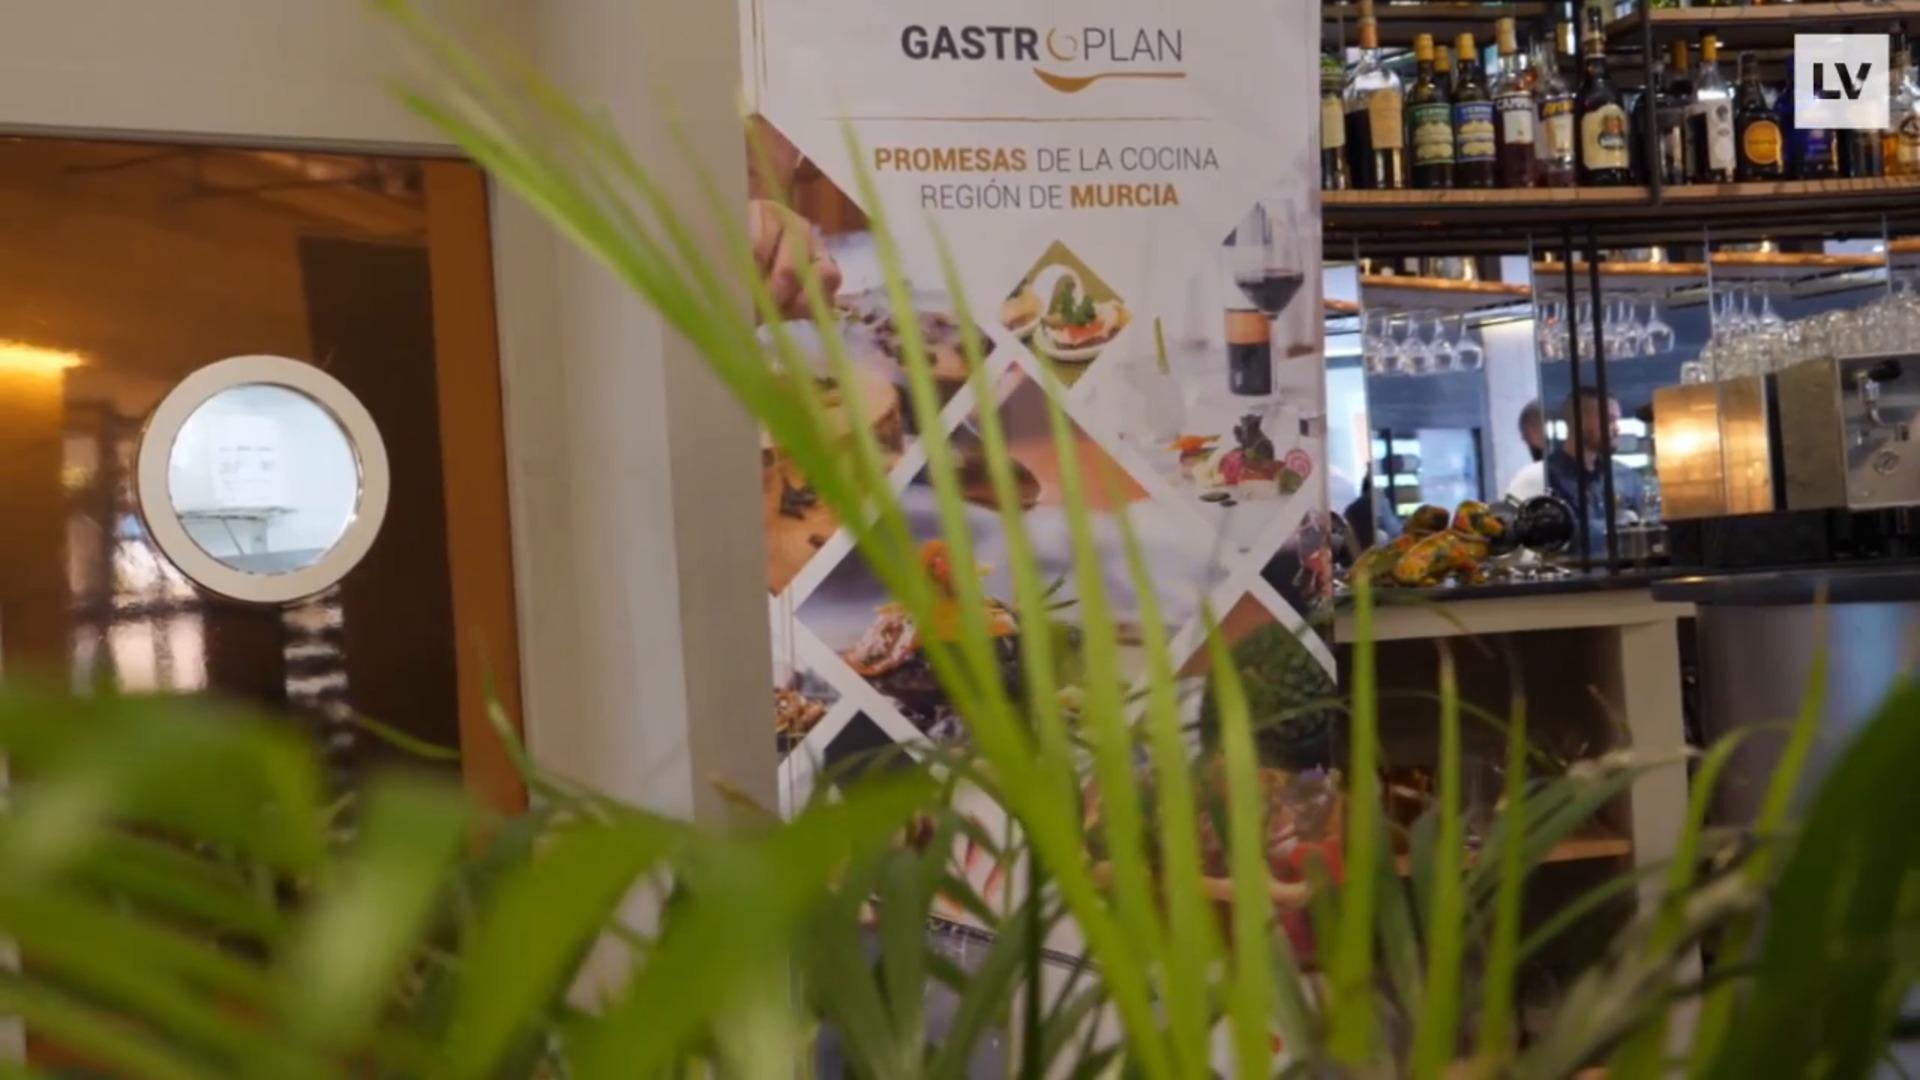 Trece promesas de la gastronomía regional